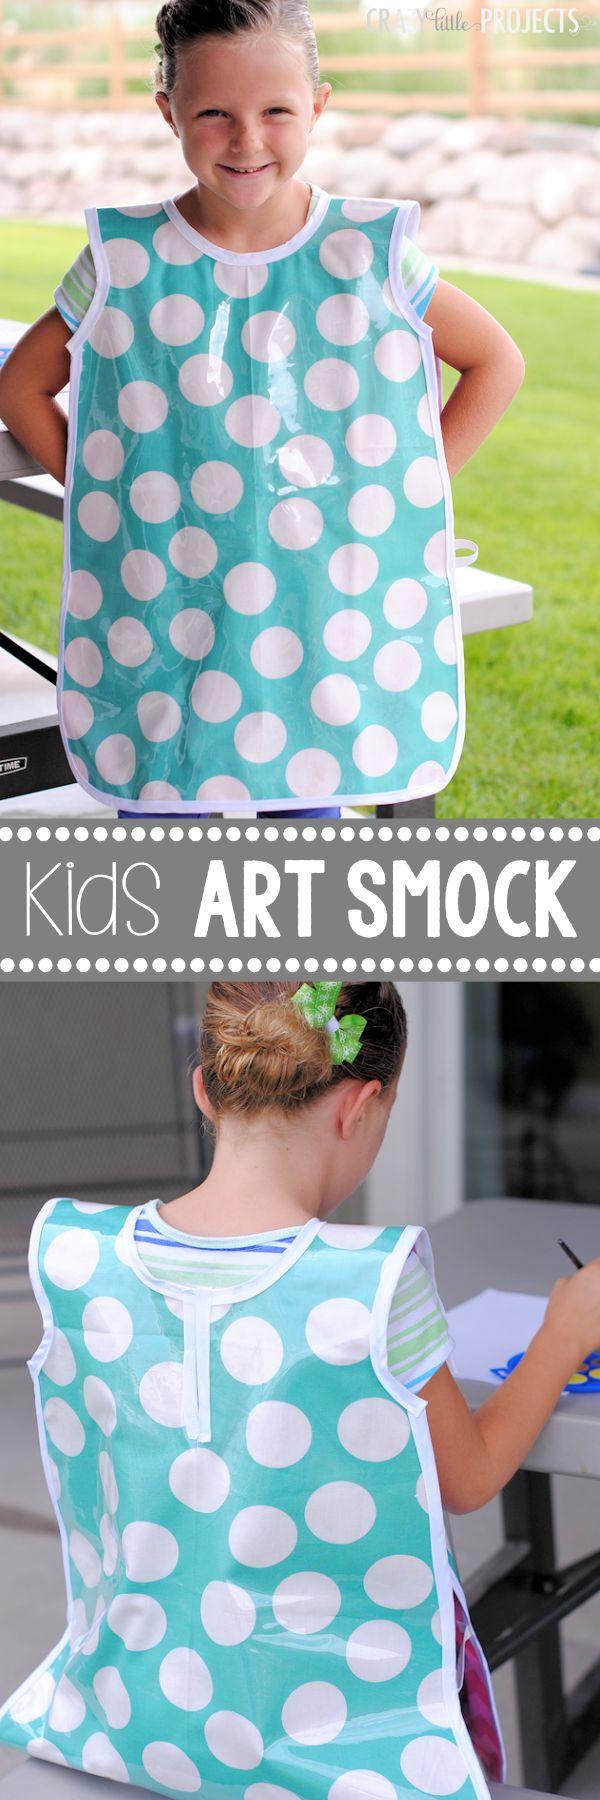 Kid's Art Smock Pattern and Tutorial